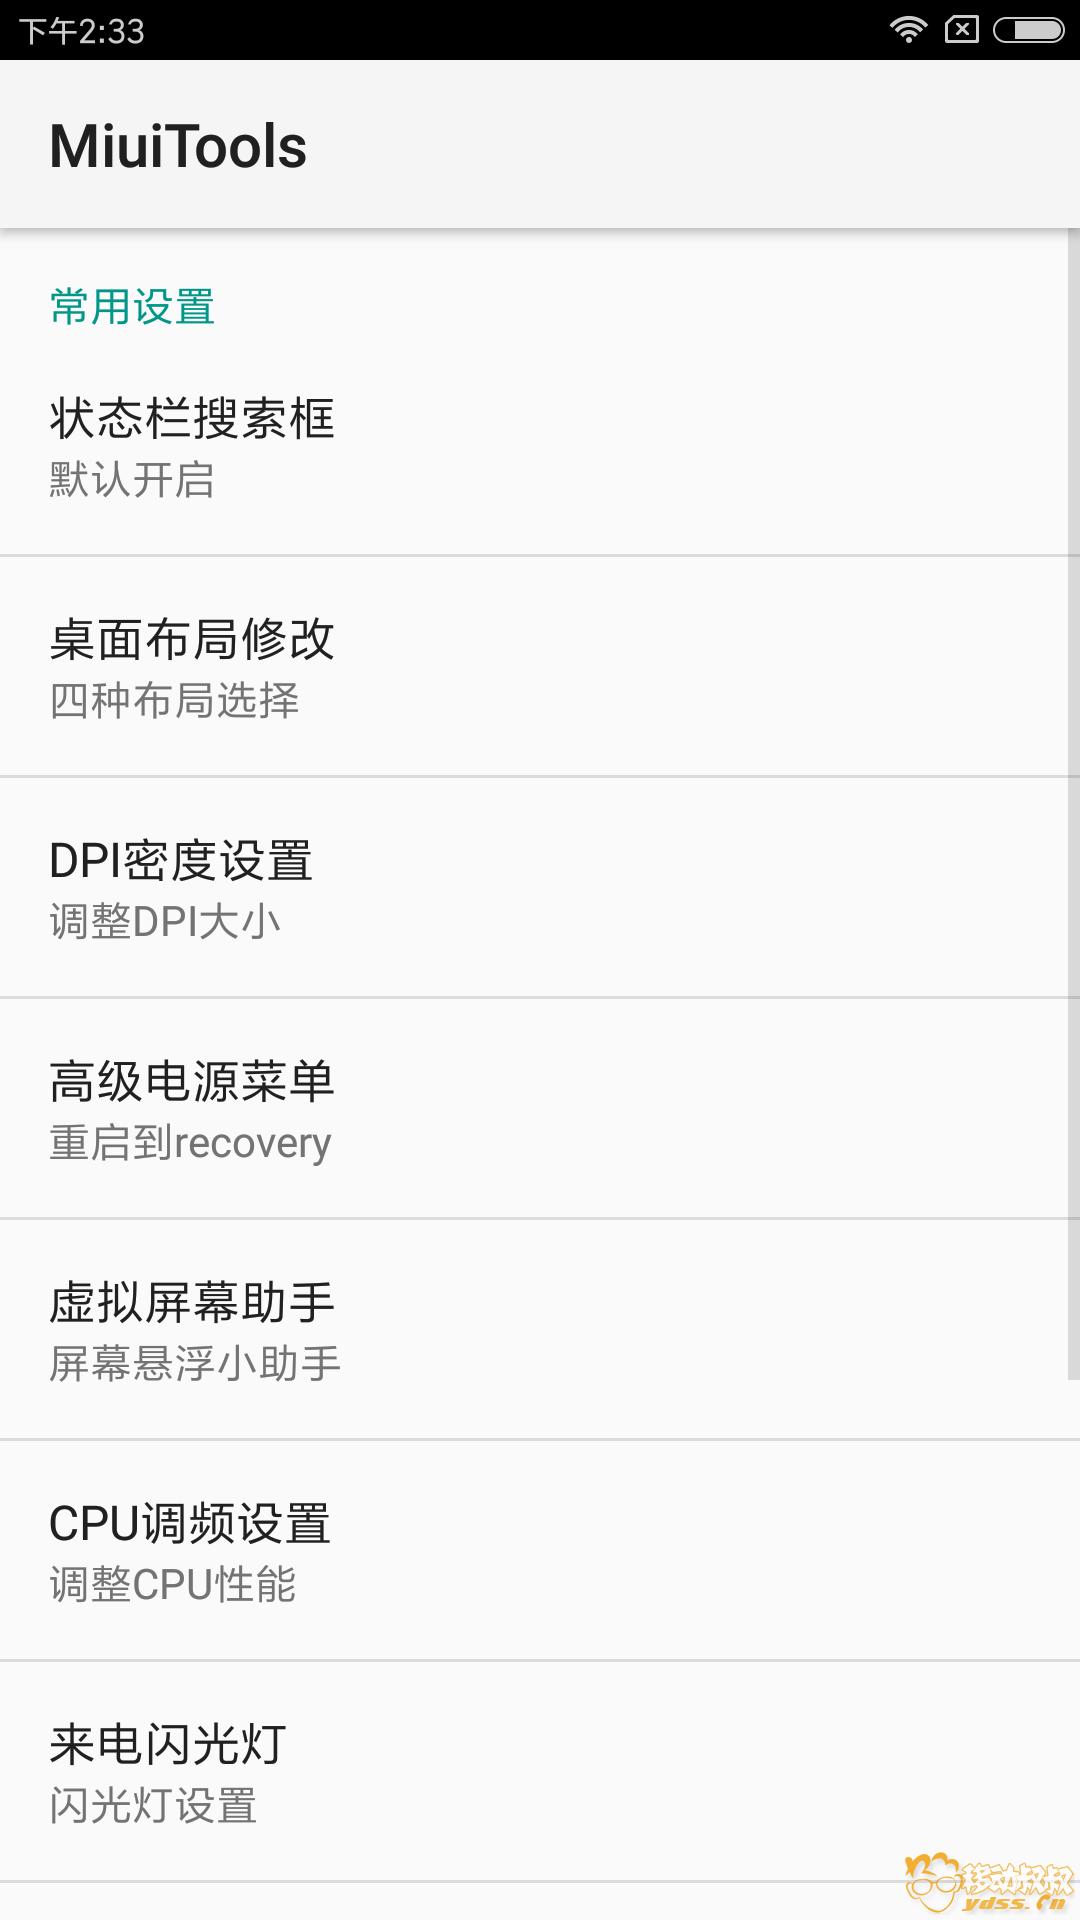 Screenshot_2017-08-12-14-33-02-283_com.anzhi.hwsettings.png